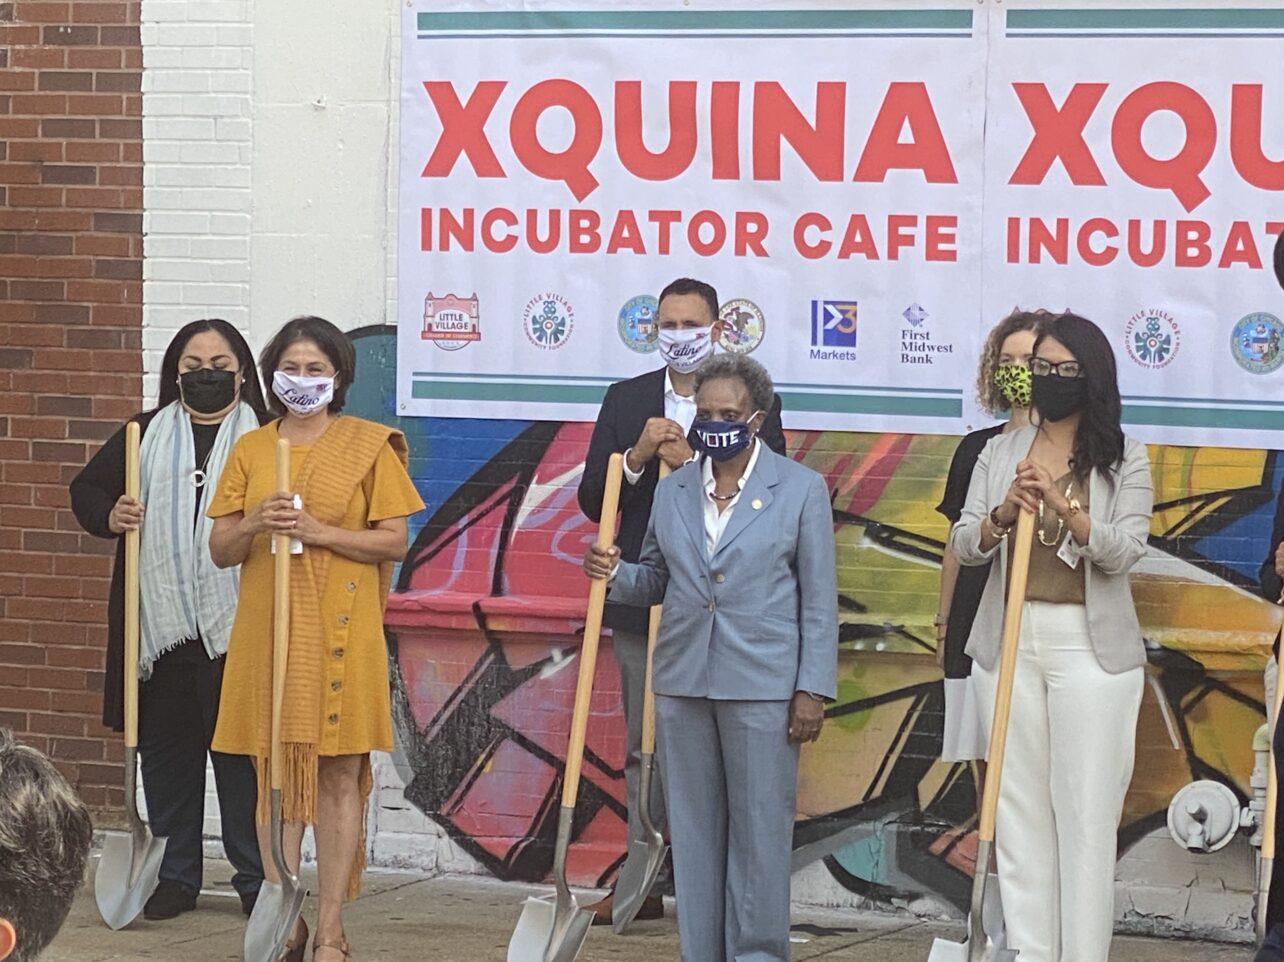 Xquina Groundbreaking - P3 Markets